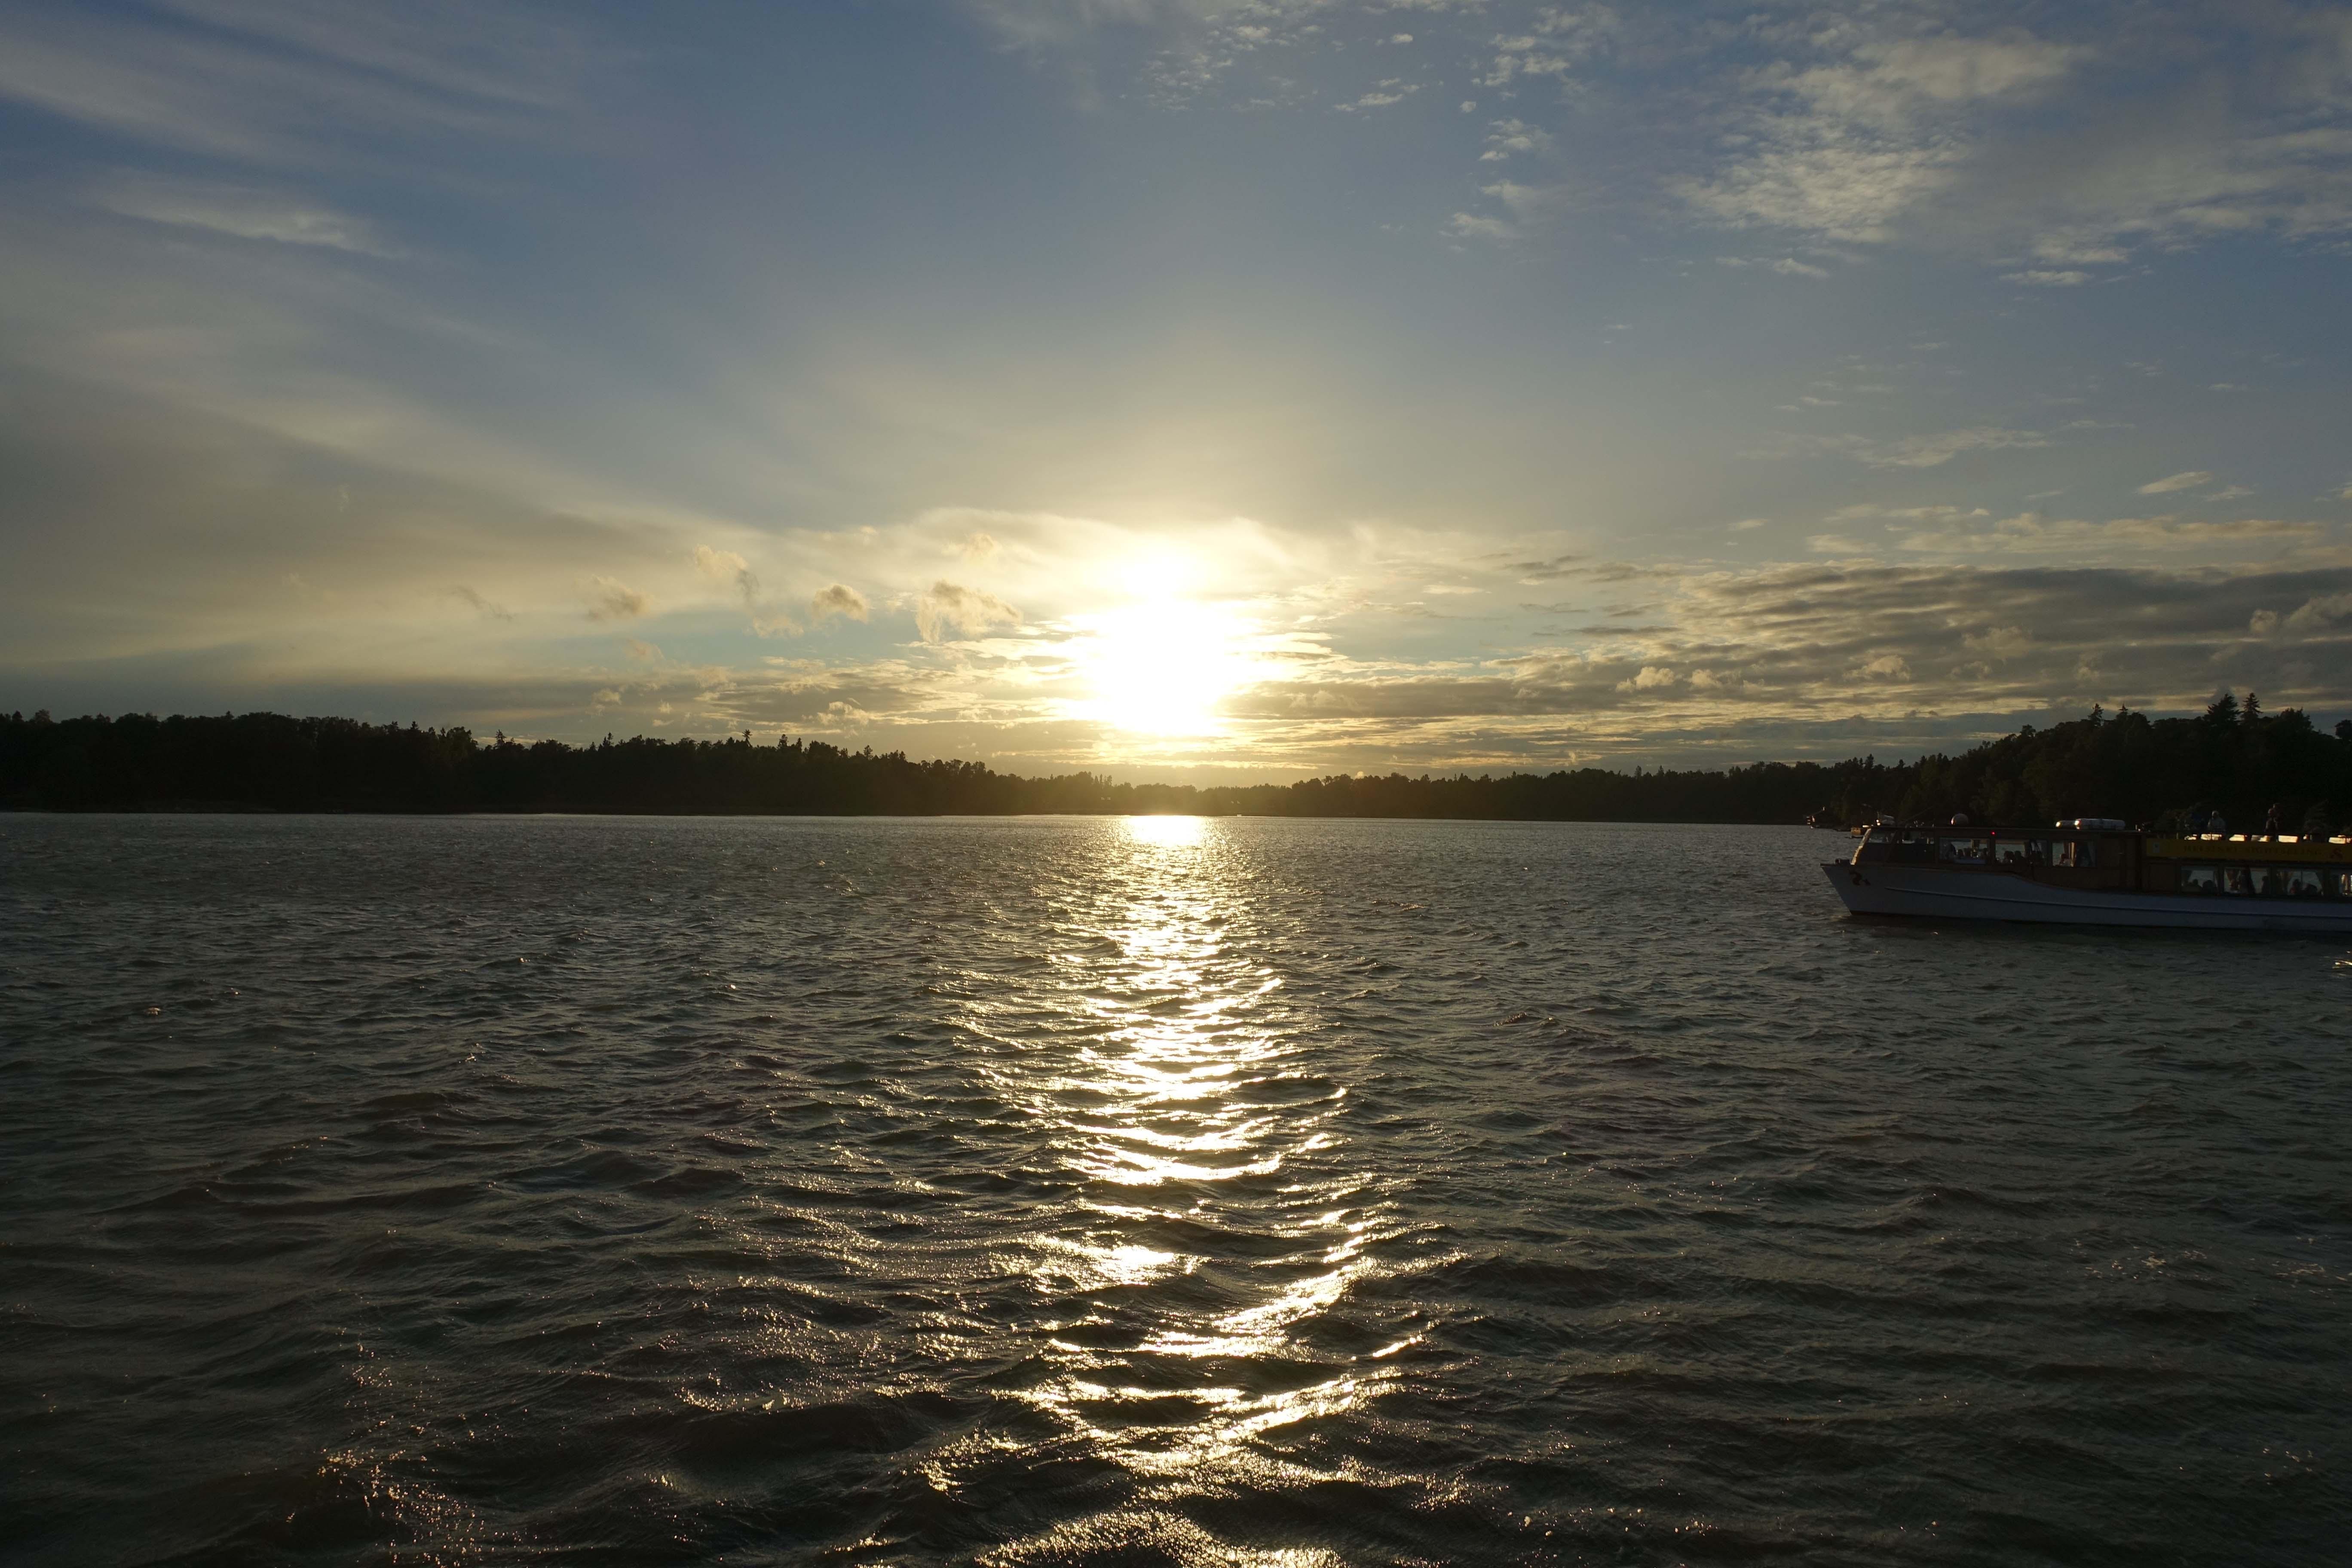 Helsinki Midsummer's Sunset